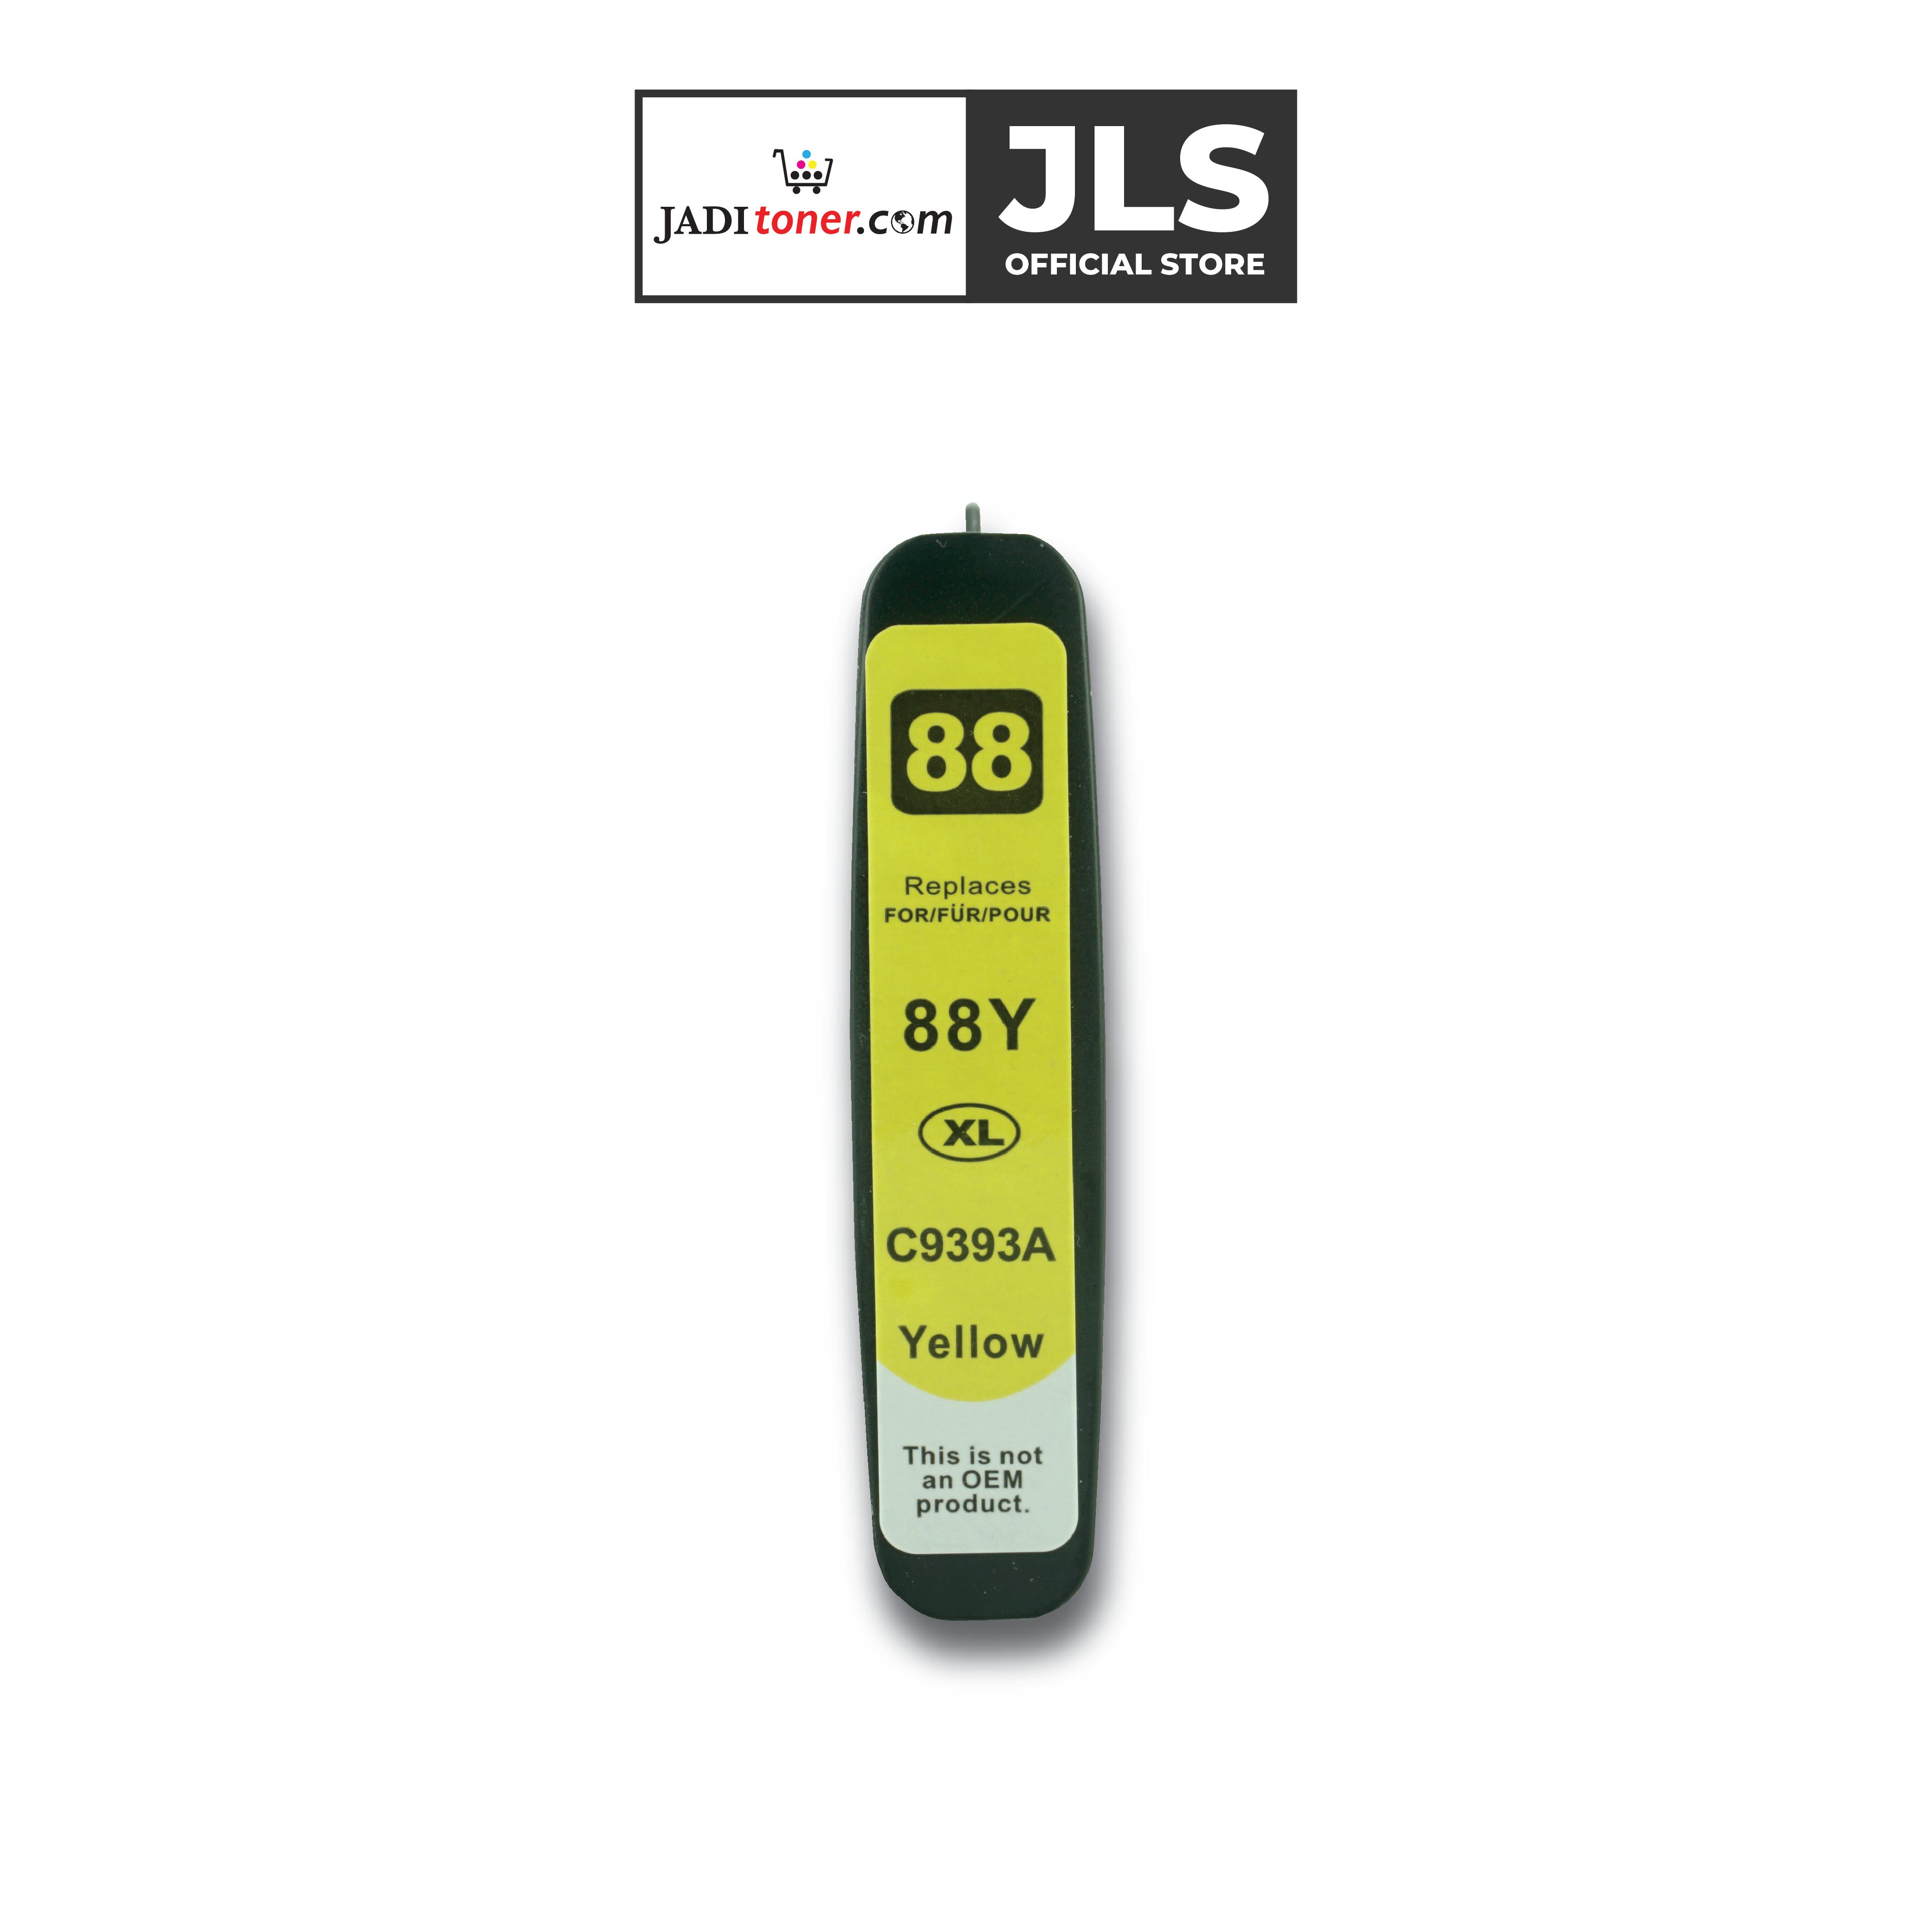 Jadi HP 88 Yellow Remanufactured Ink Cartridge